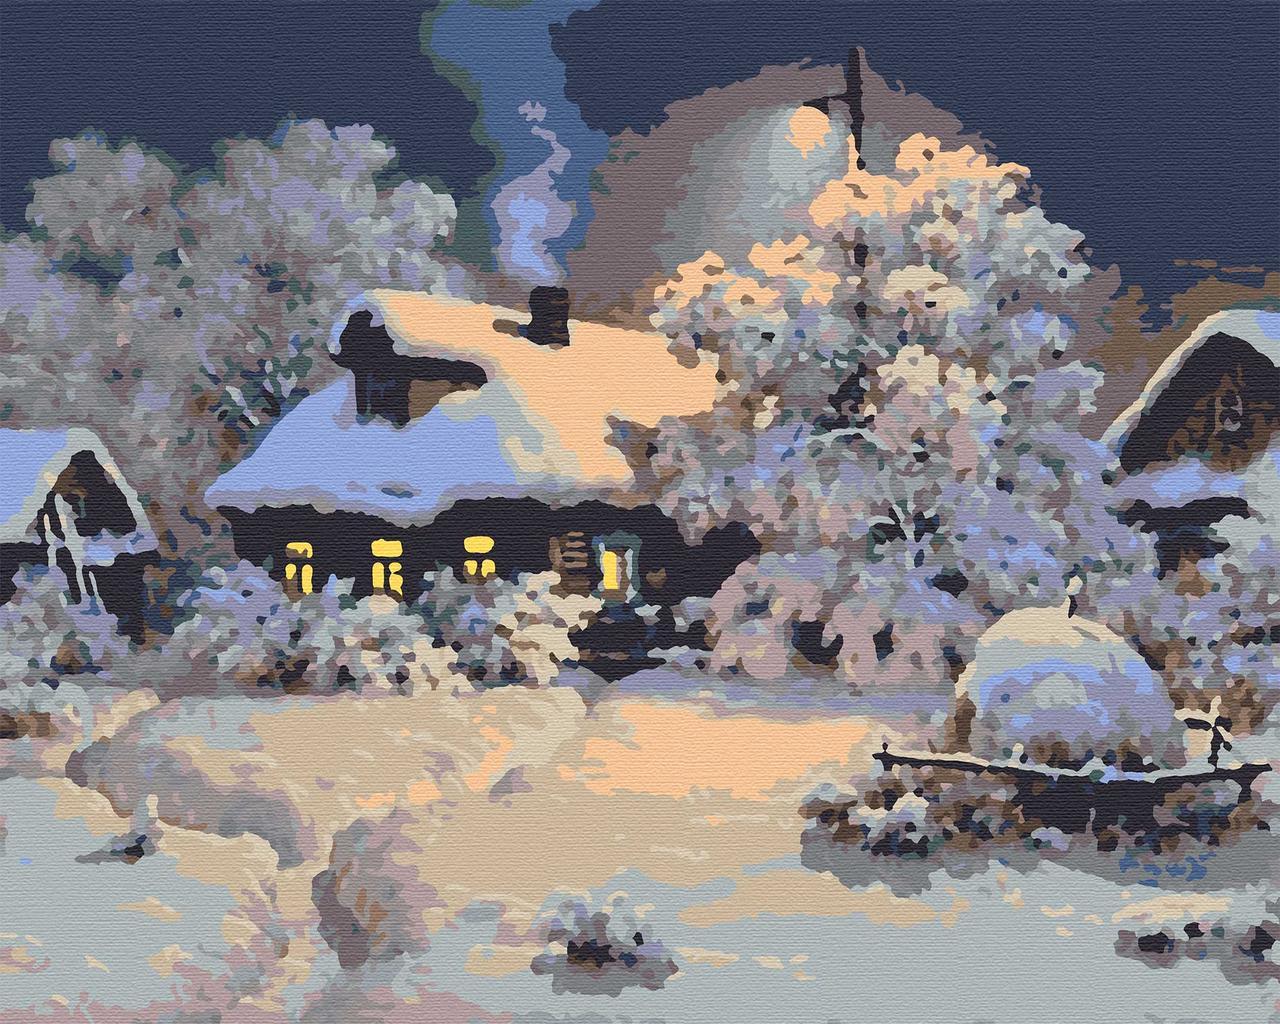 Картина по номерах природа пейзаж 40х50 Зимове село